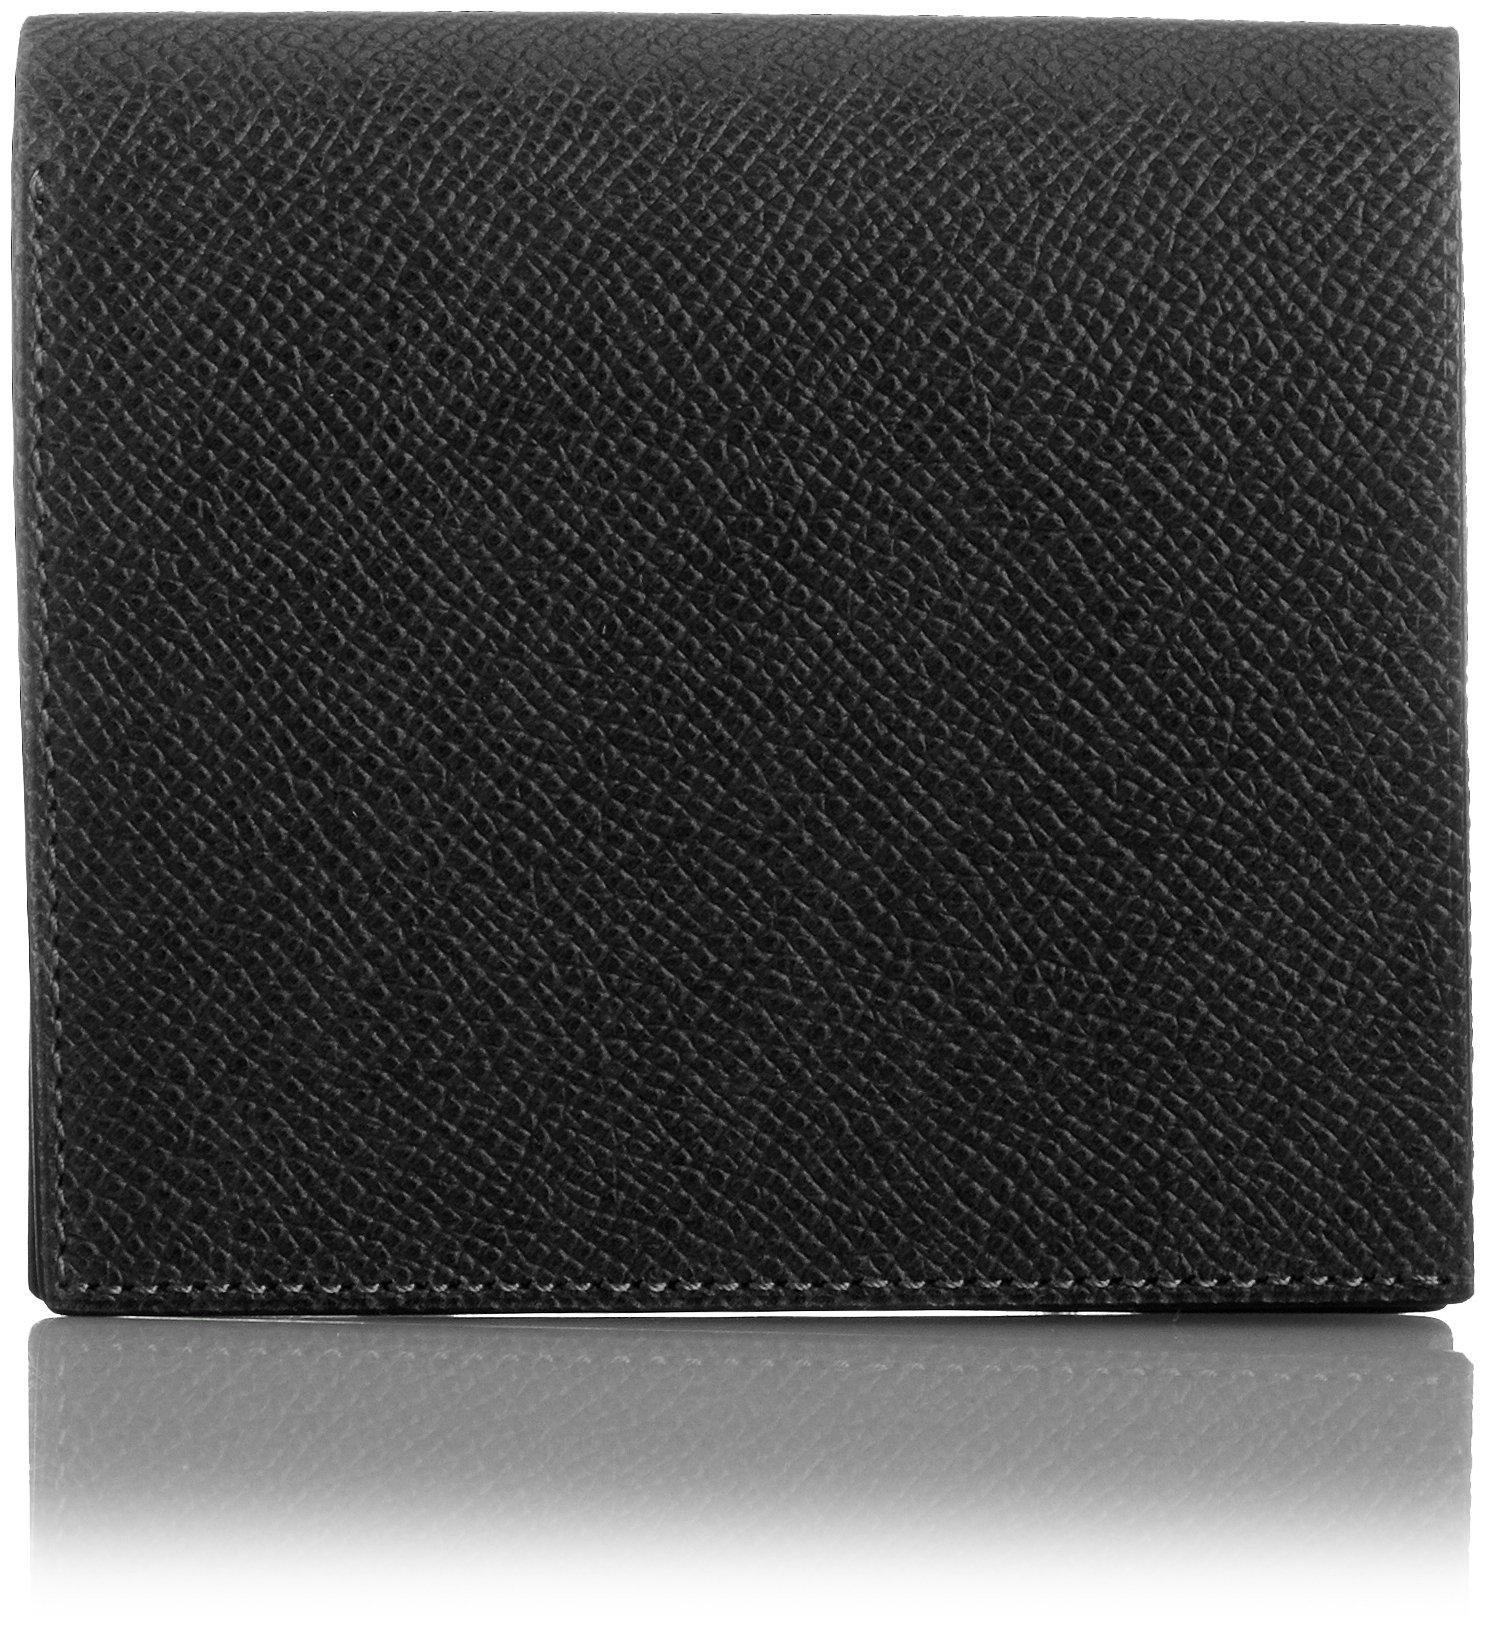 MAISON de HIROAN Leather Bifold Wallet Made in Japan 21553 Black/Blue